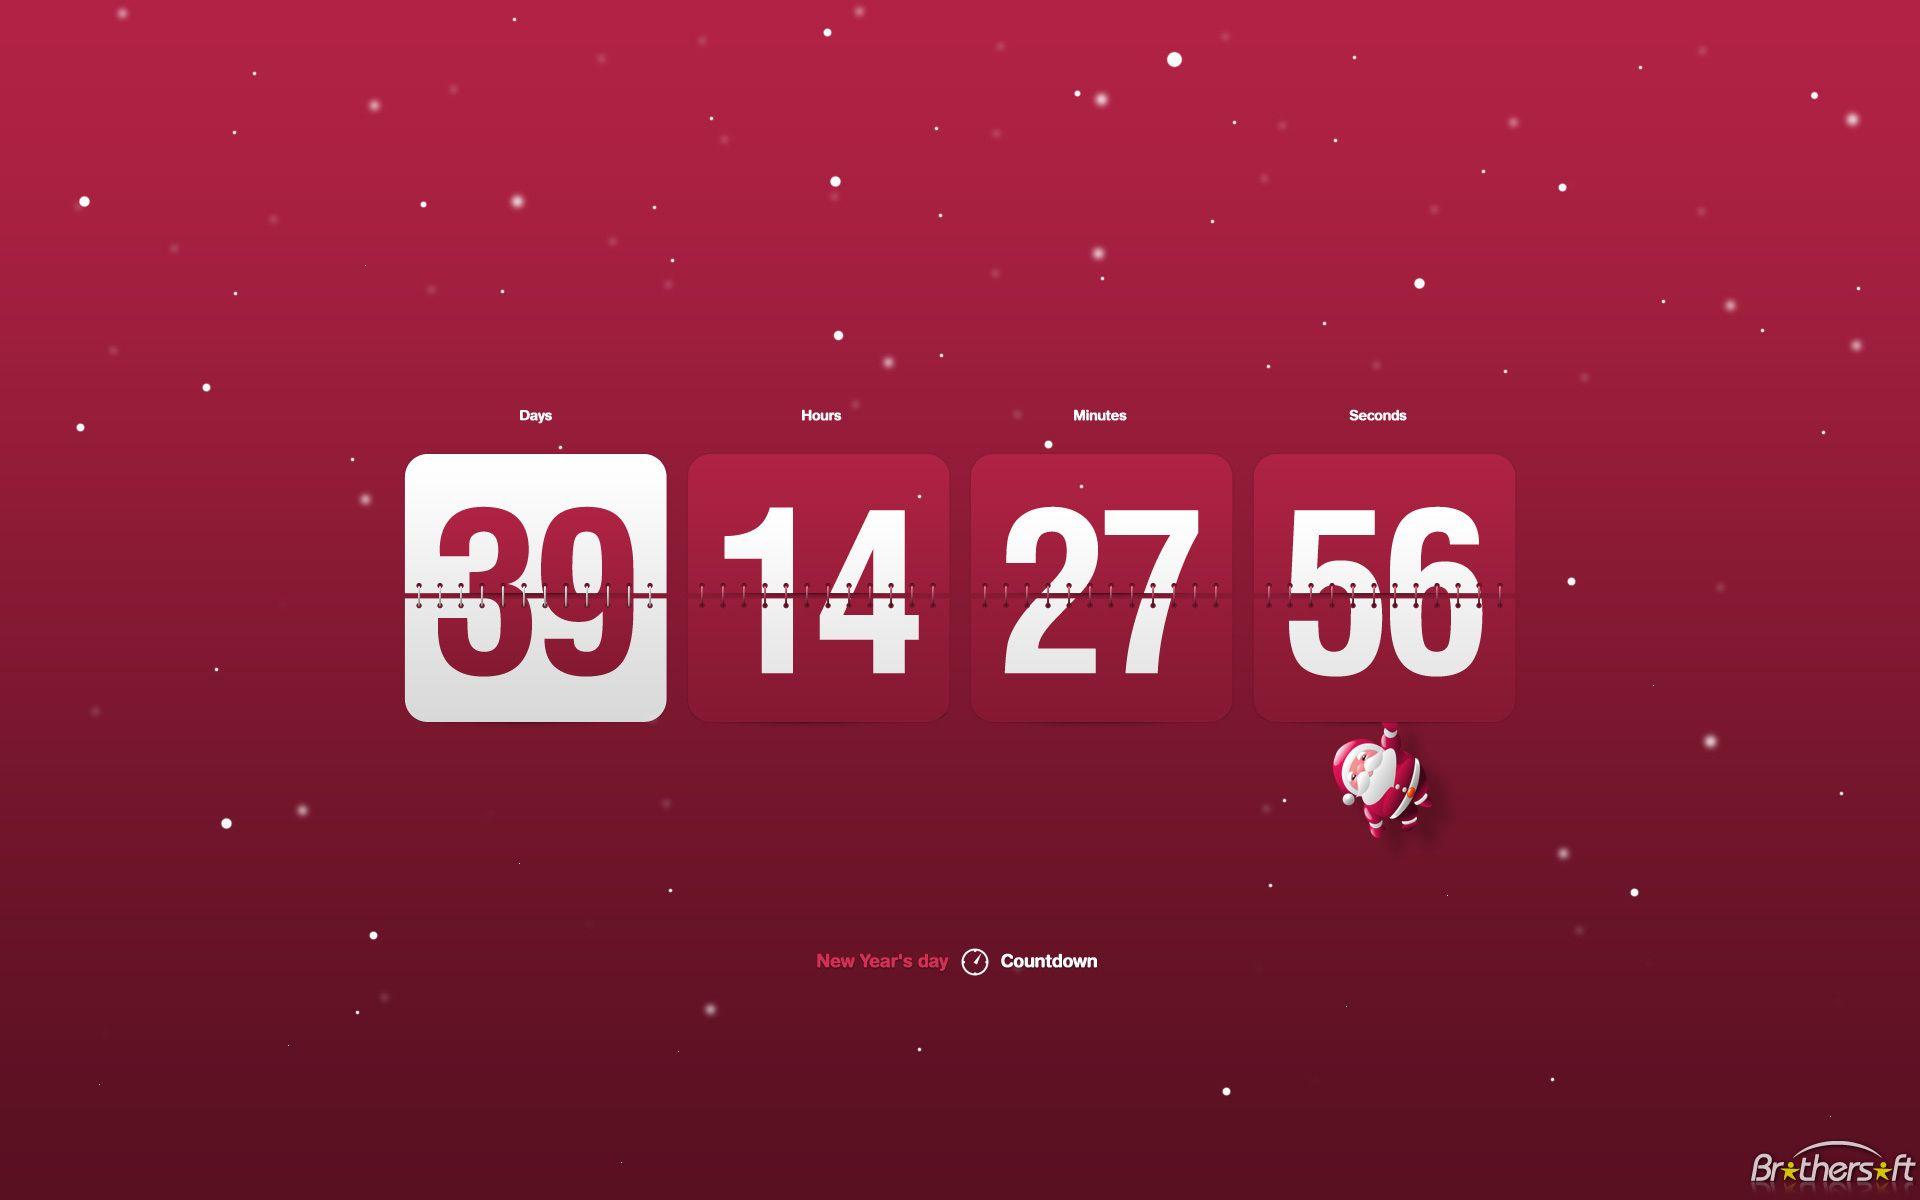 New Year Countdown Clock Clock Screensaver Countdown Clock Retirement Countdown